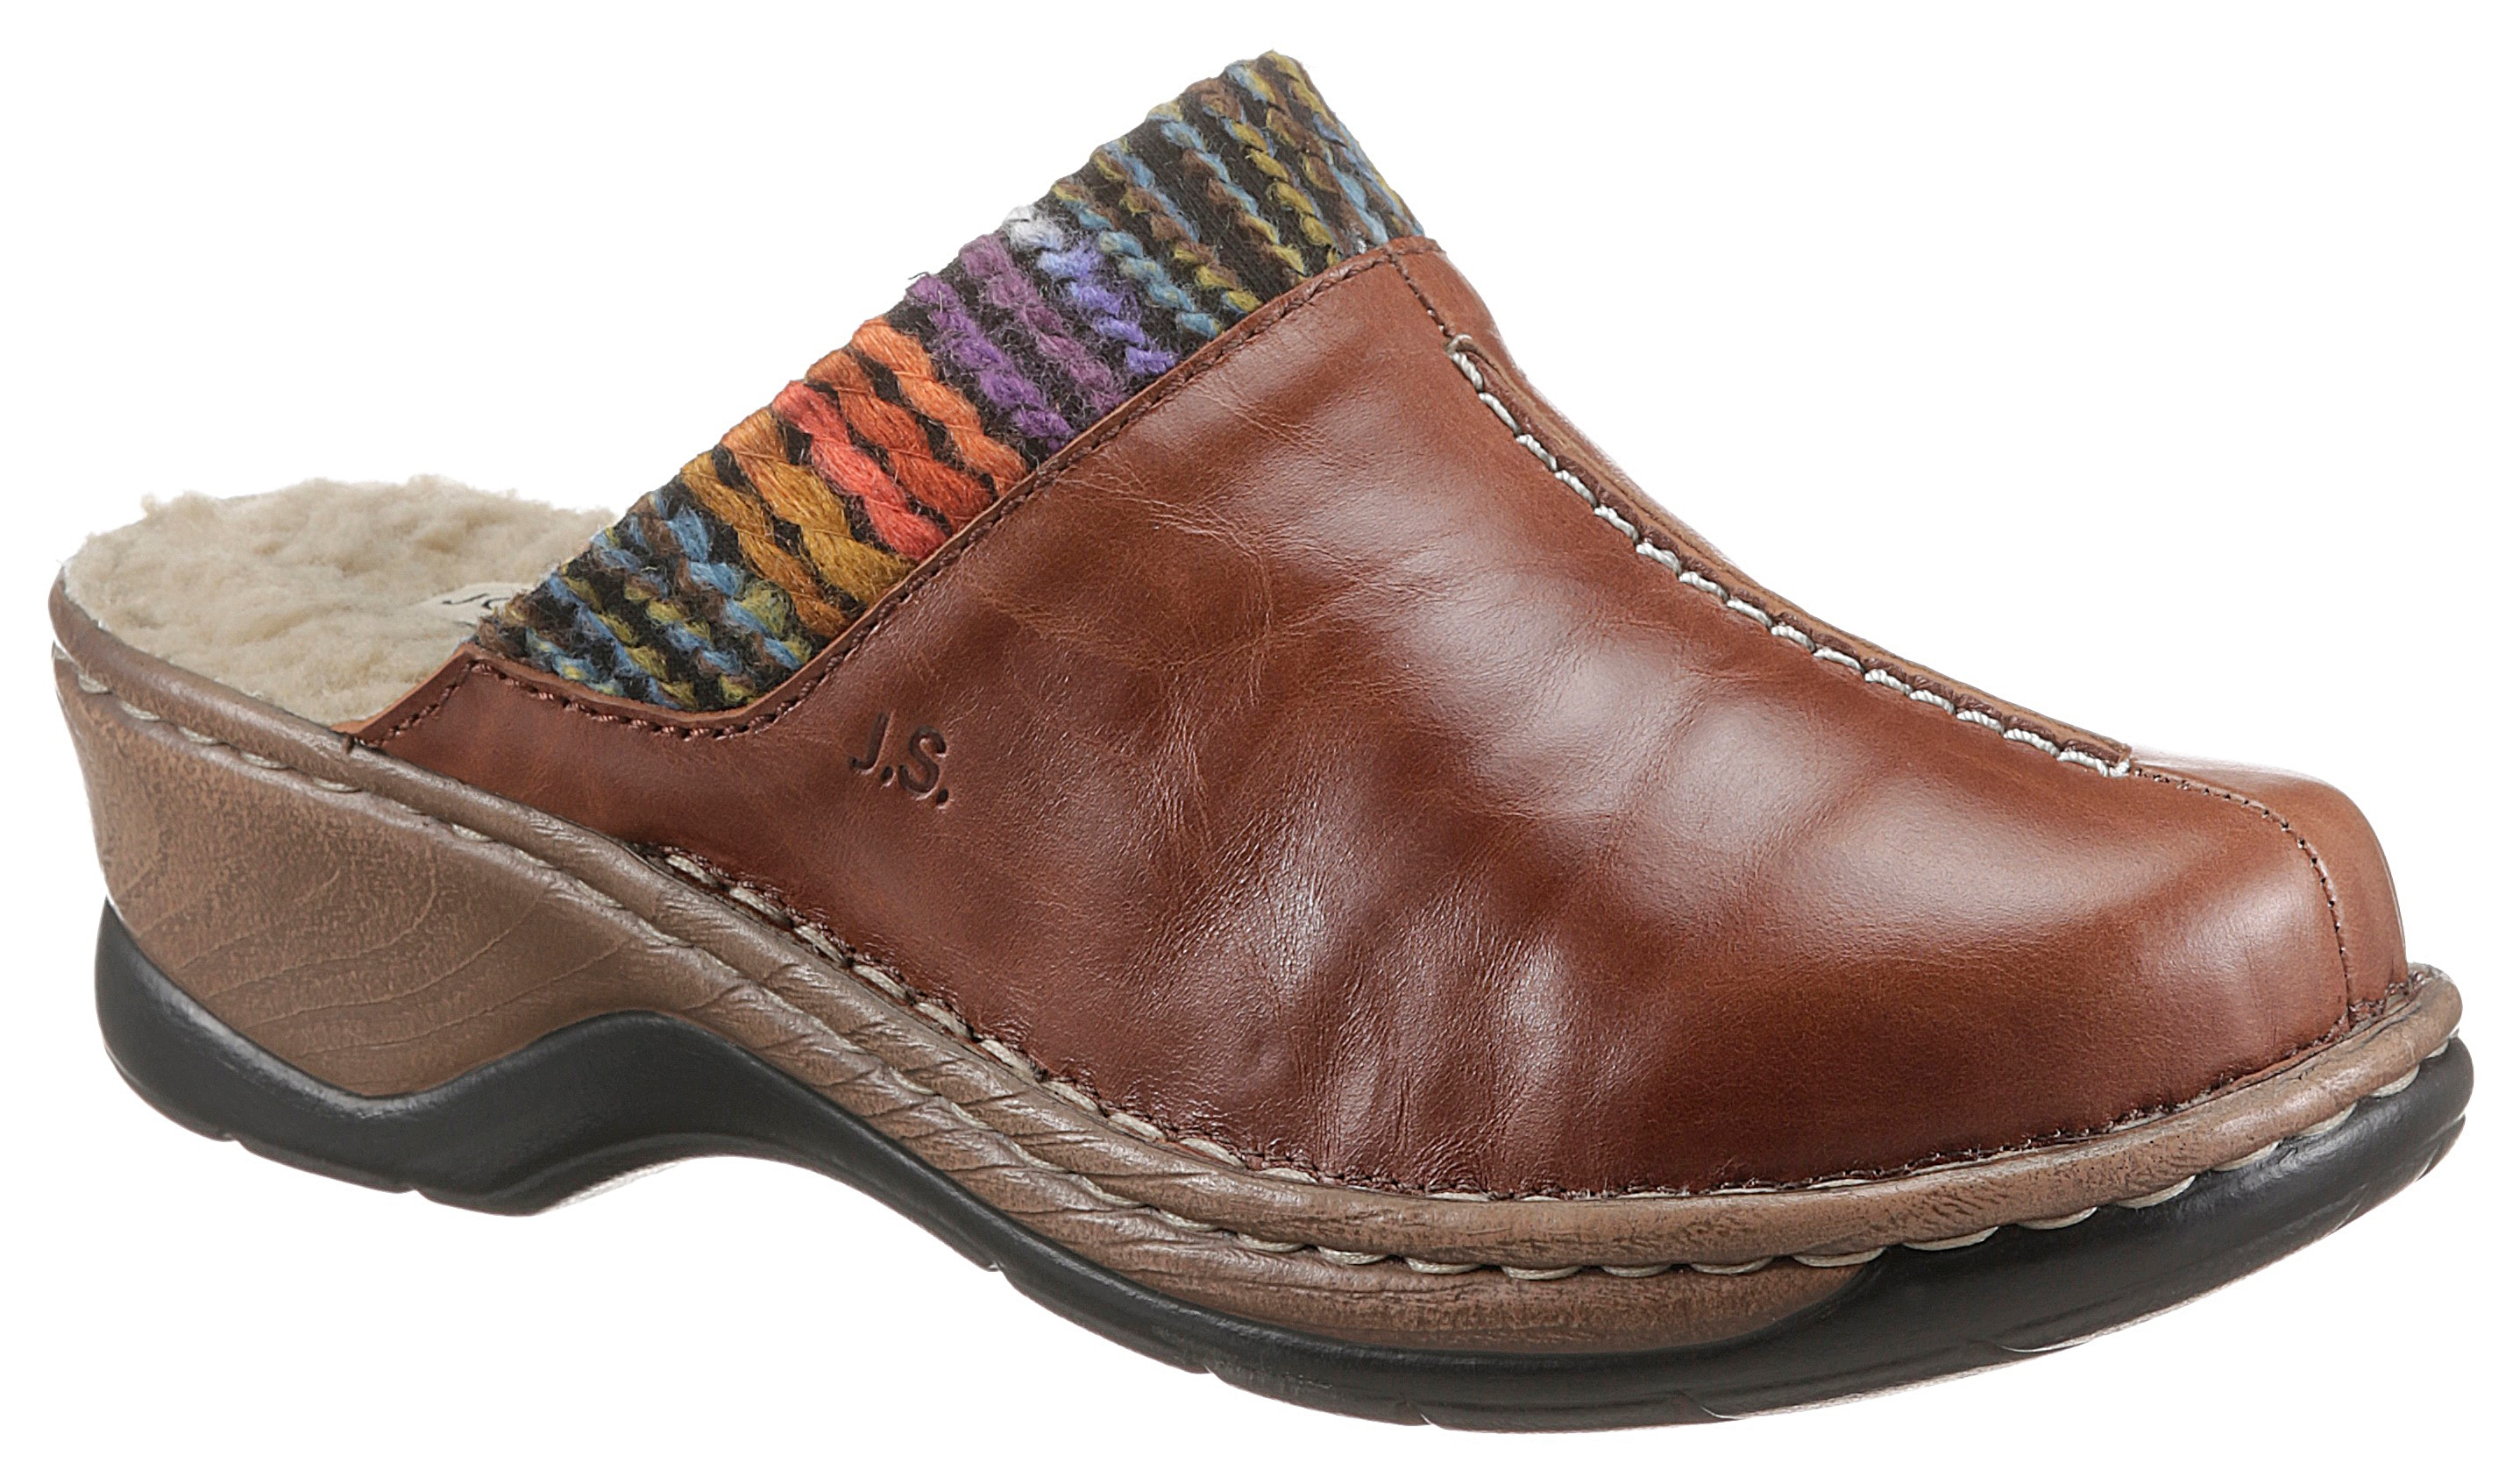 josef seibel -  Clog CATALONIA 59, mit buntem Textilbesatz